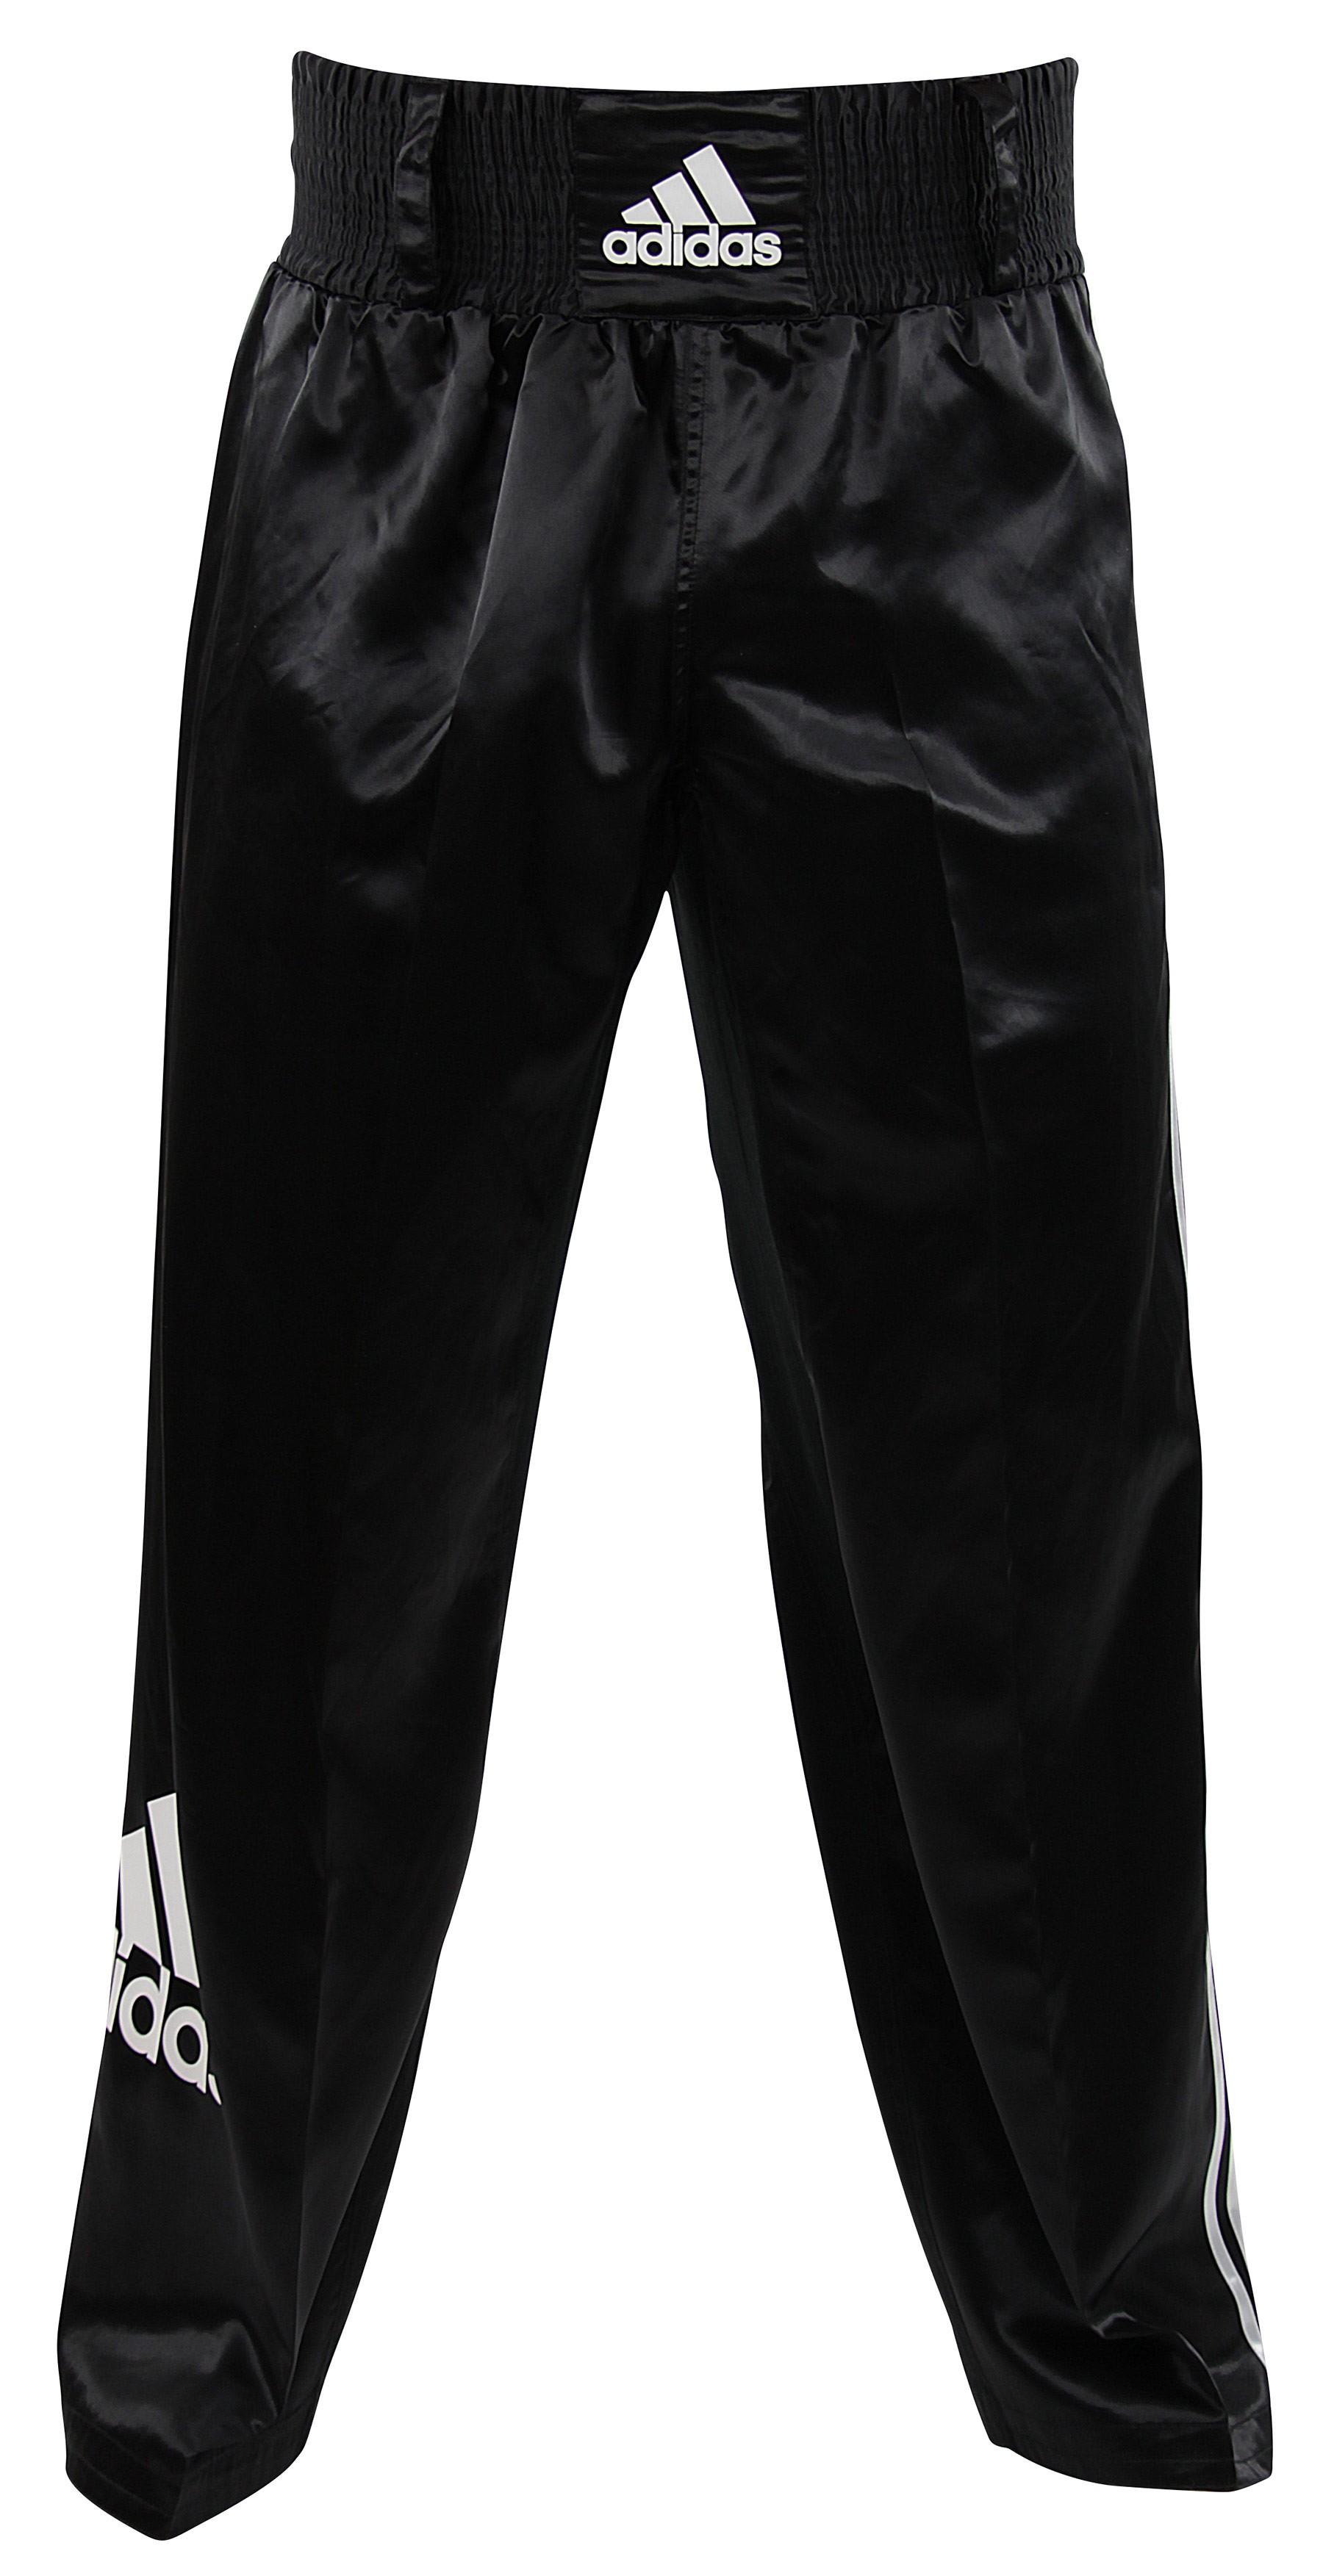 Pantalon full contact adidas sur boutique-du-combat.com 134f9779b08e